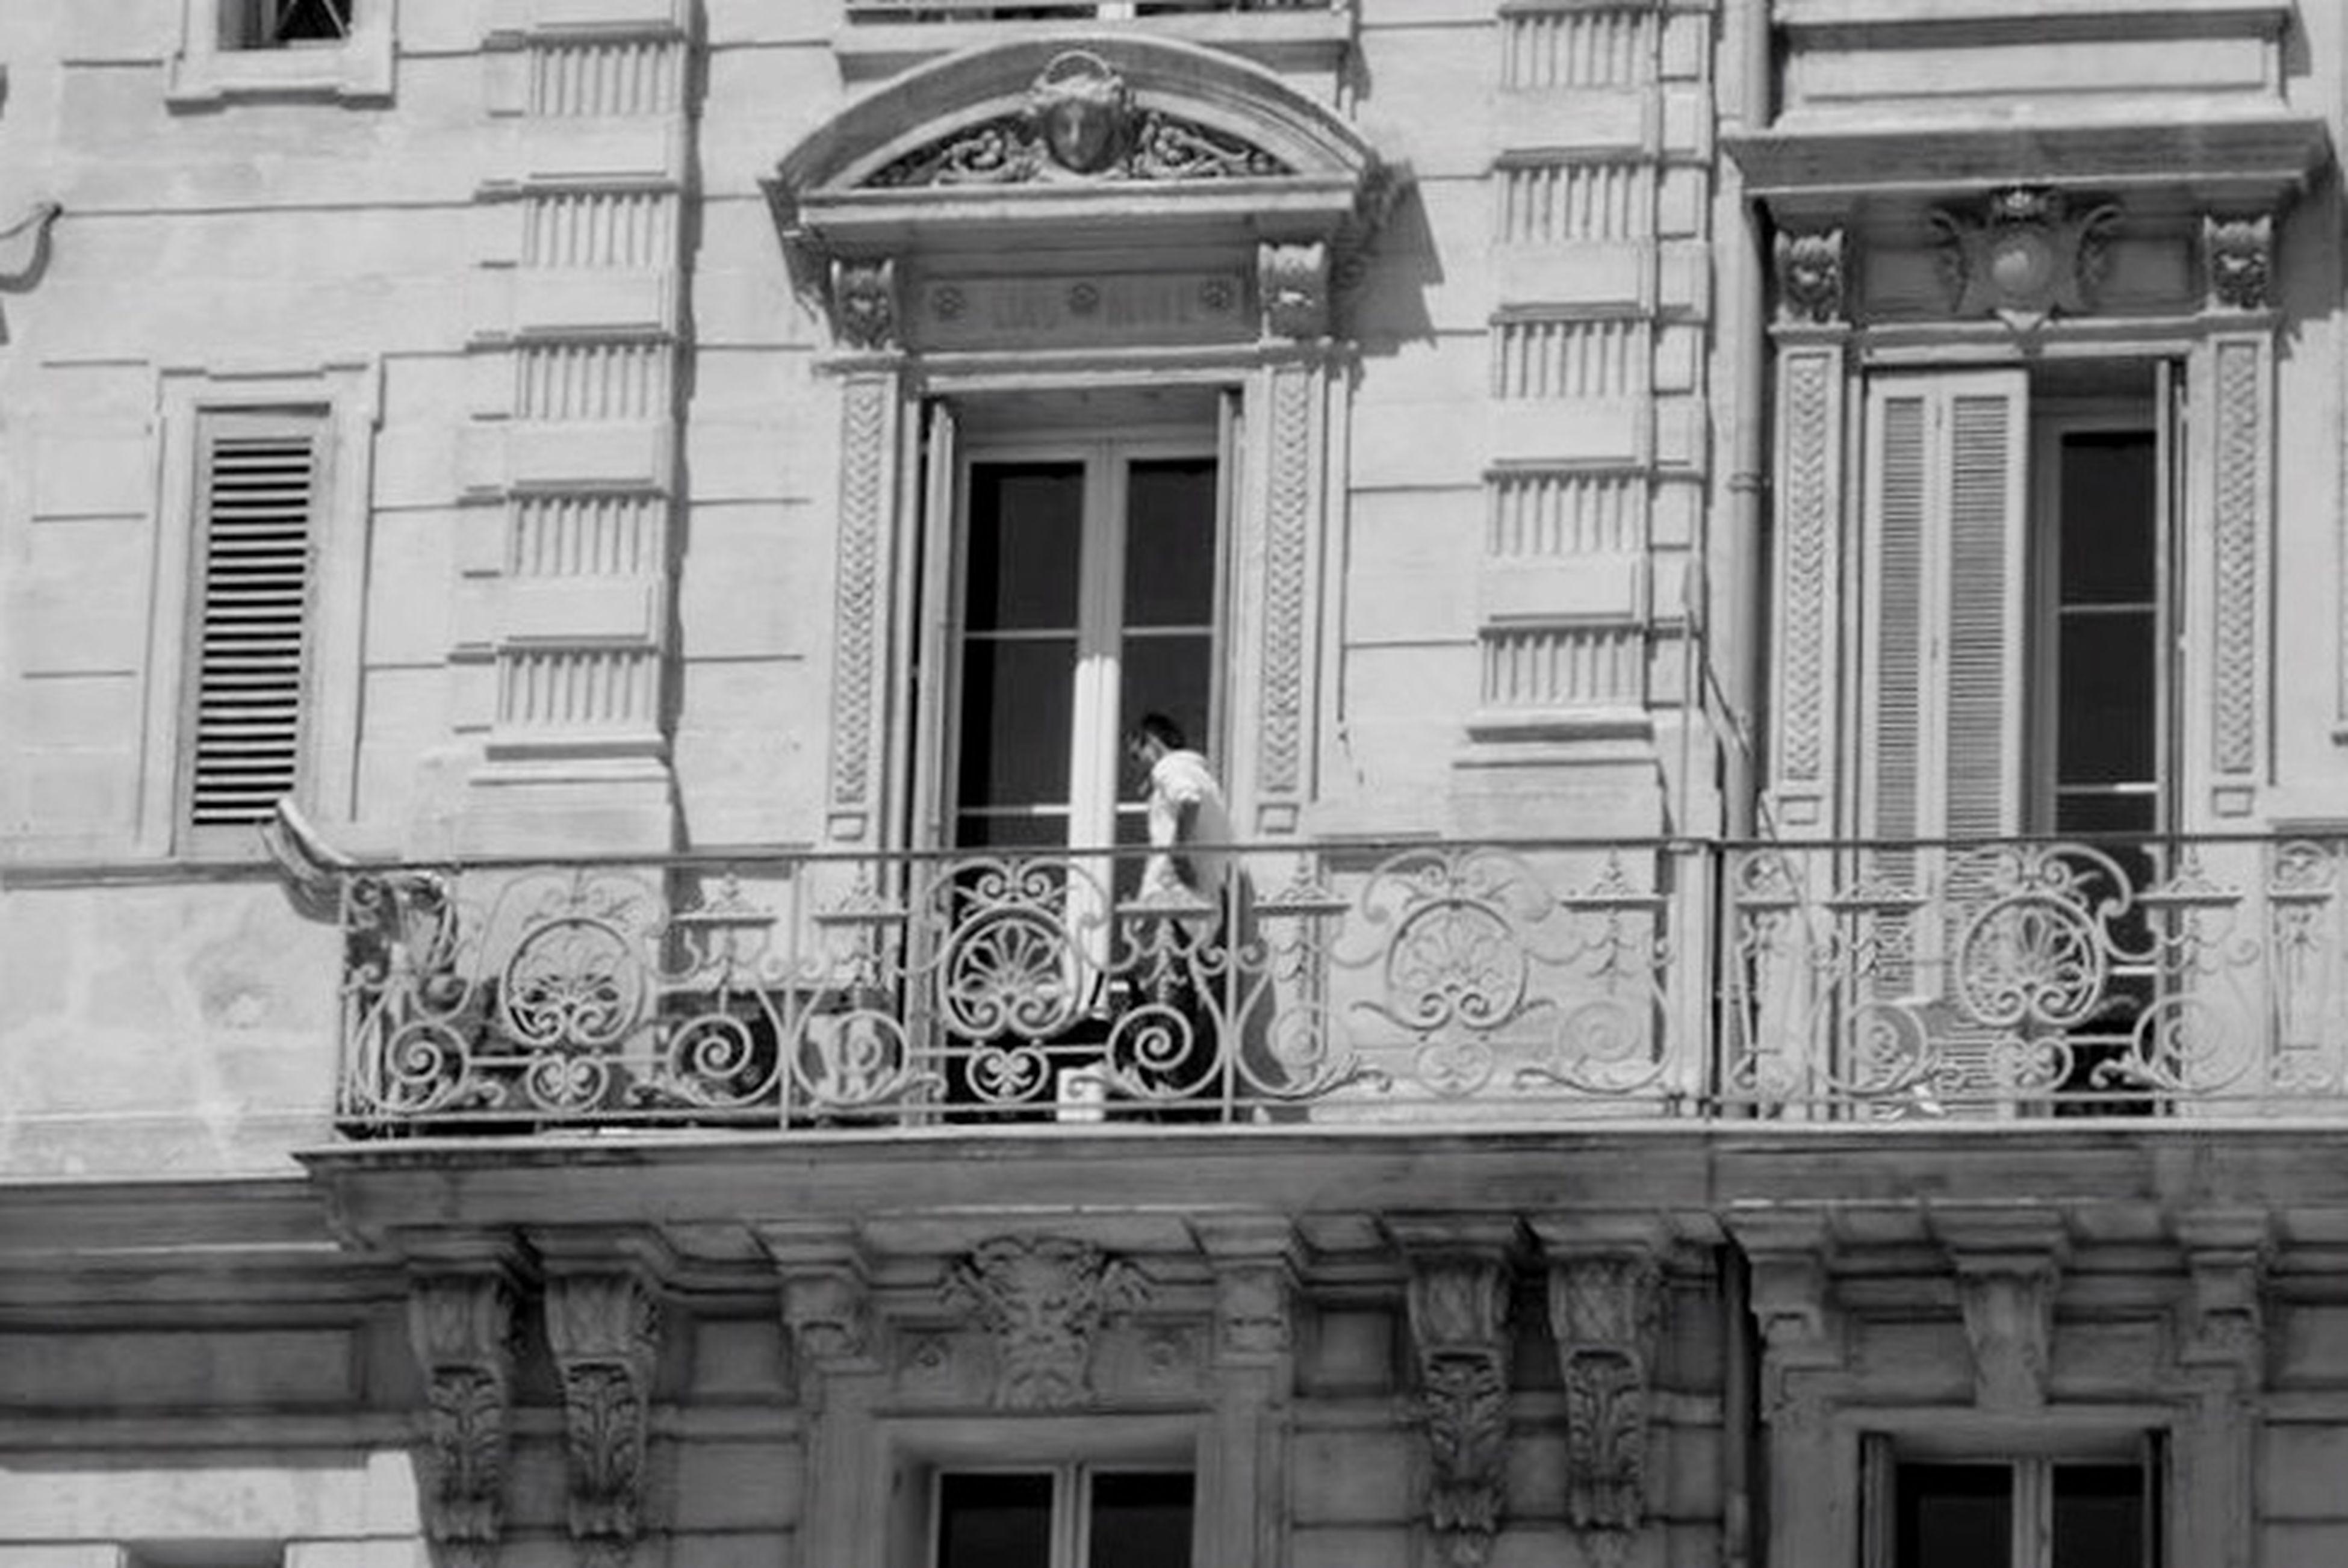 Blackandwhite Monochrome Streetphotography Architecture Balcony